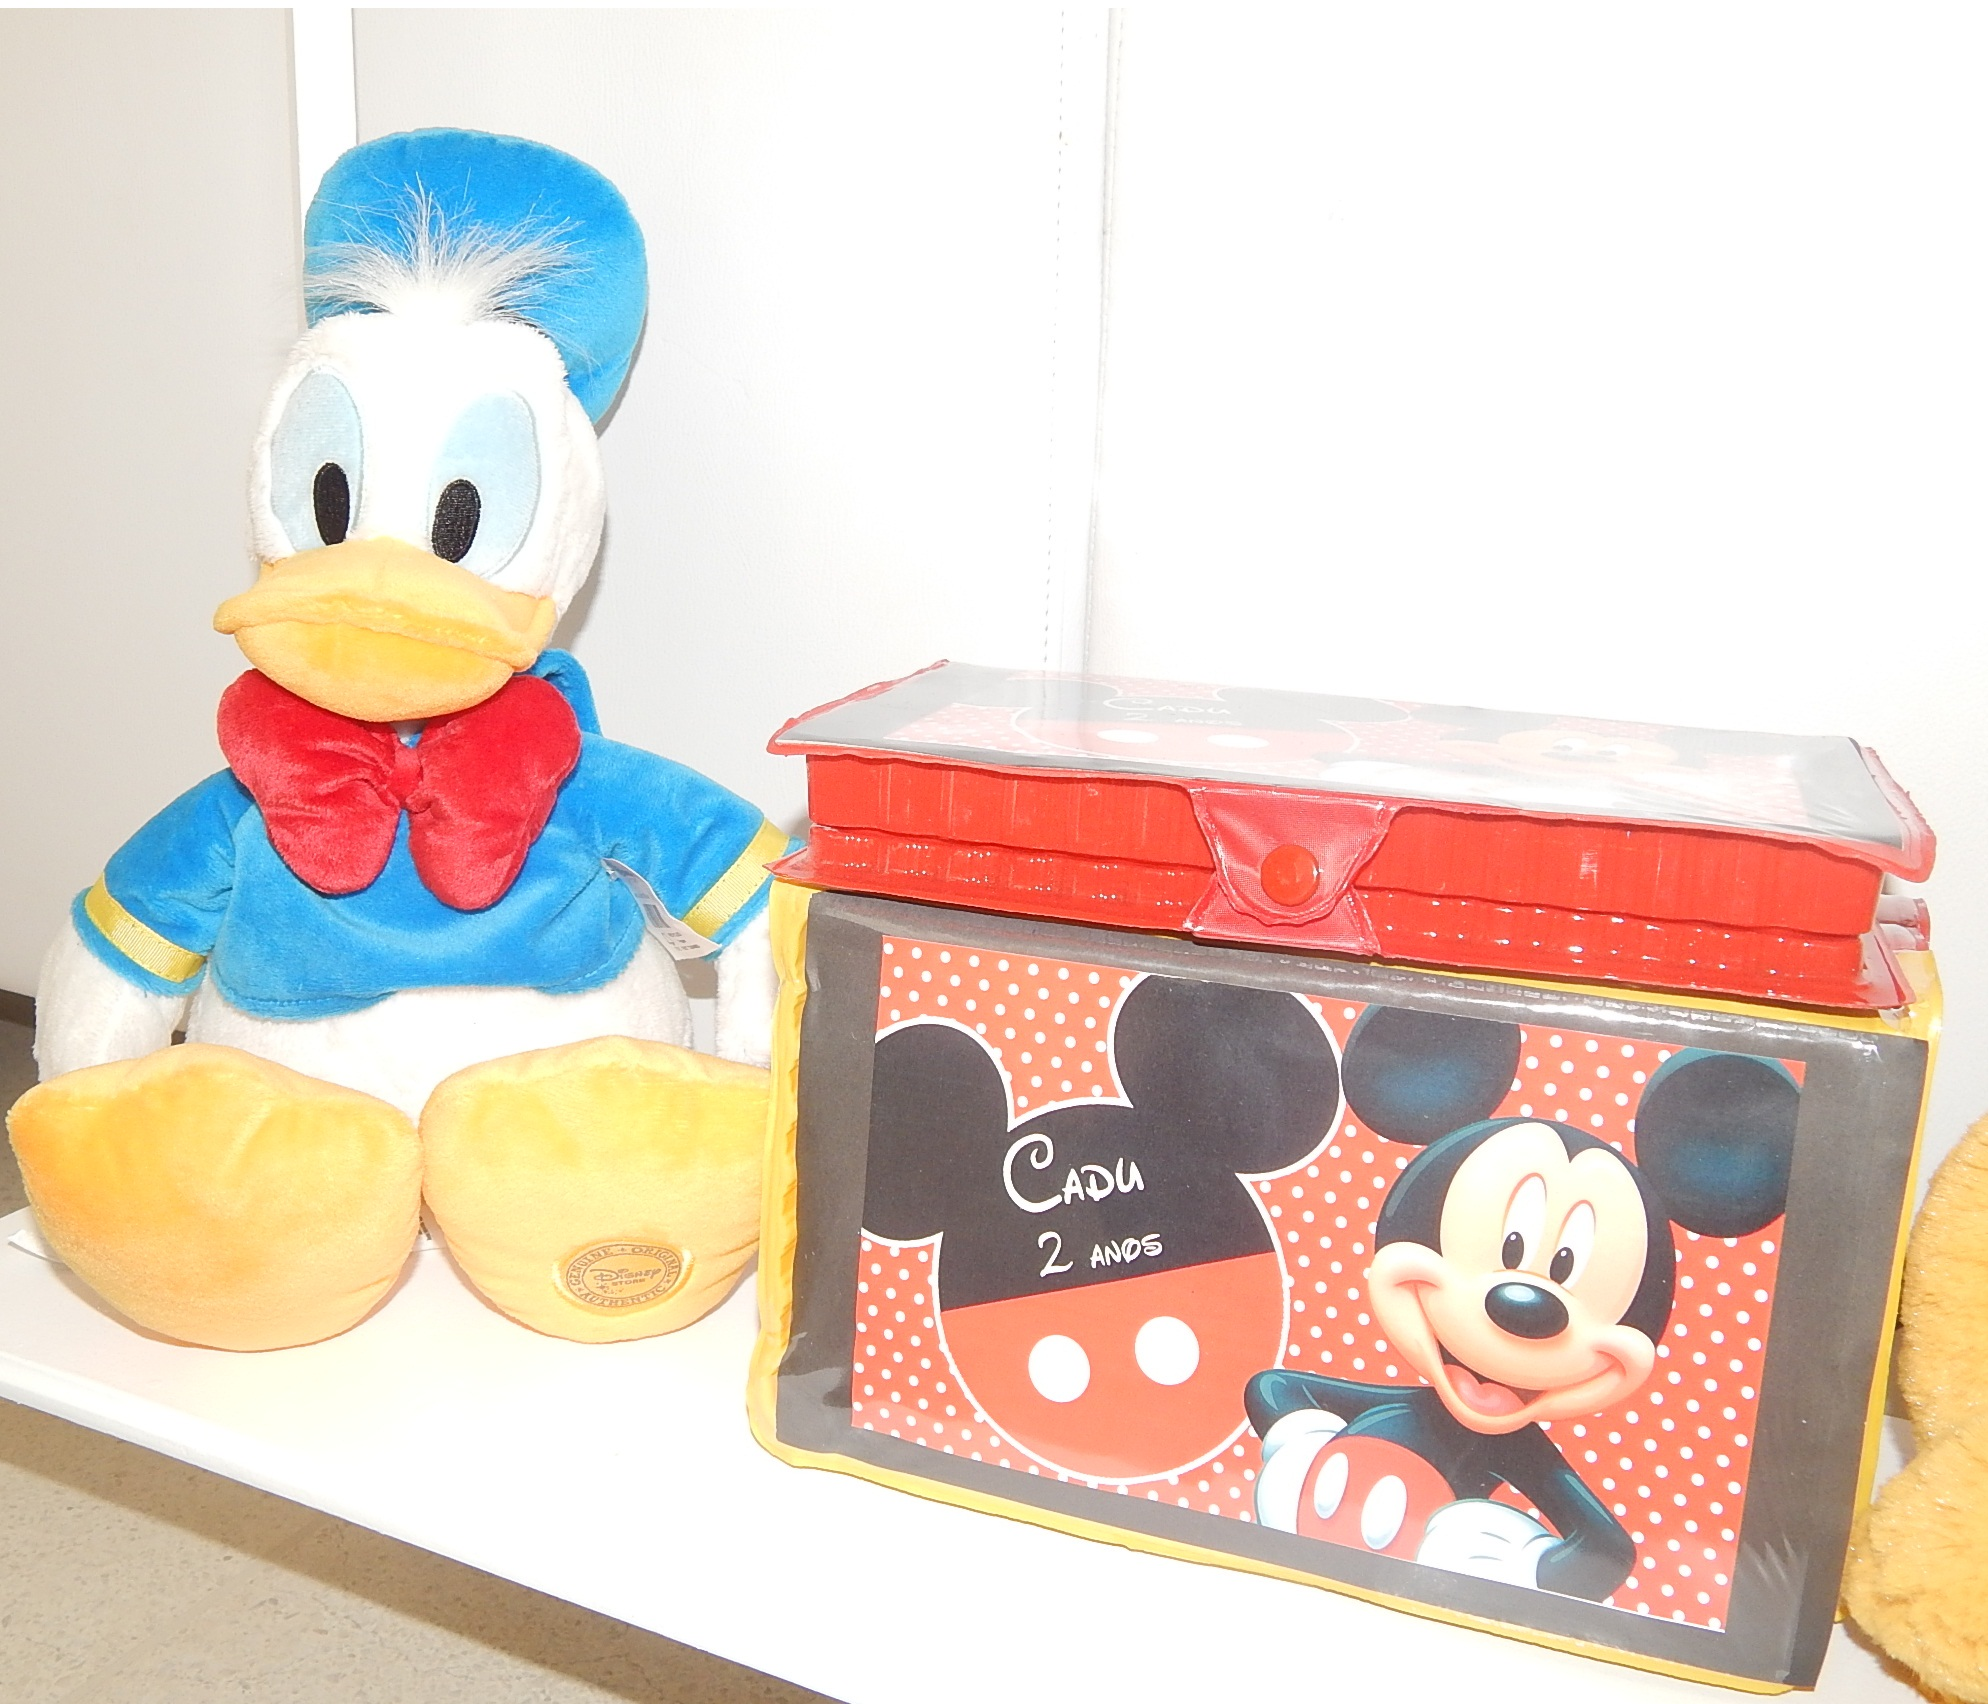 FESTA CLEAN Mickey para o Cadu  (15)